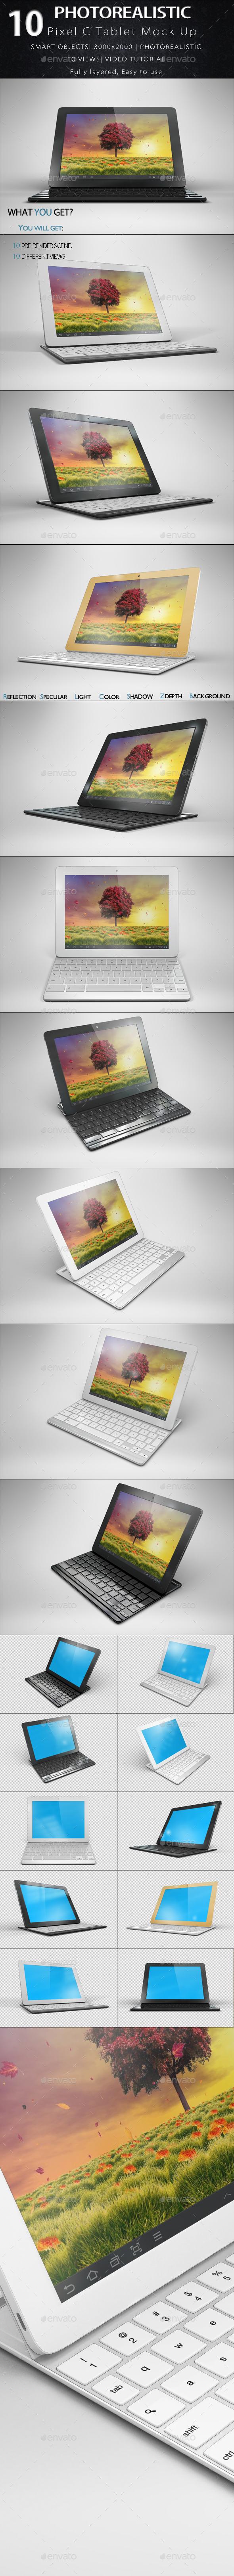 10 Gooogle Pixel C Tablet Mock Up - Product Mock-Ups Graphics